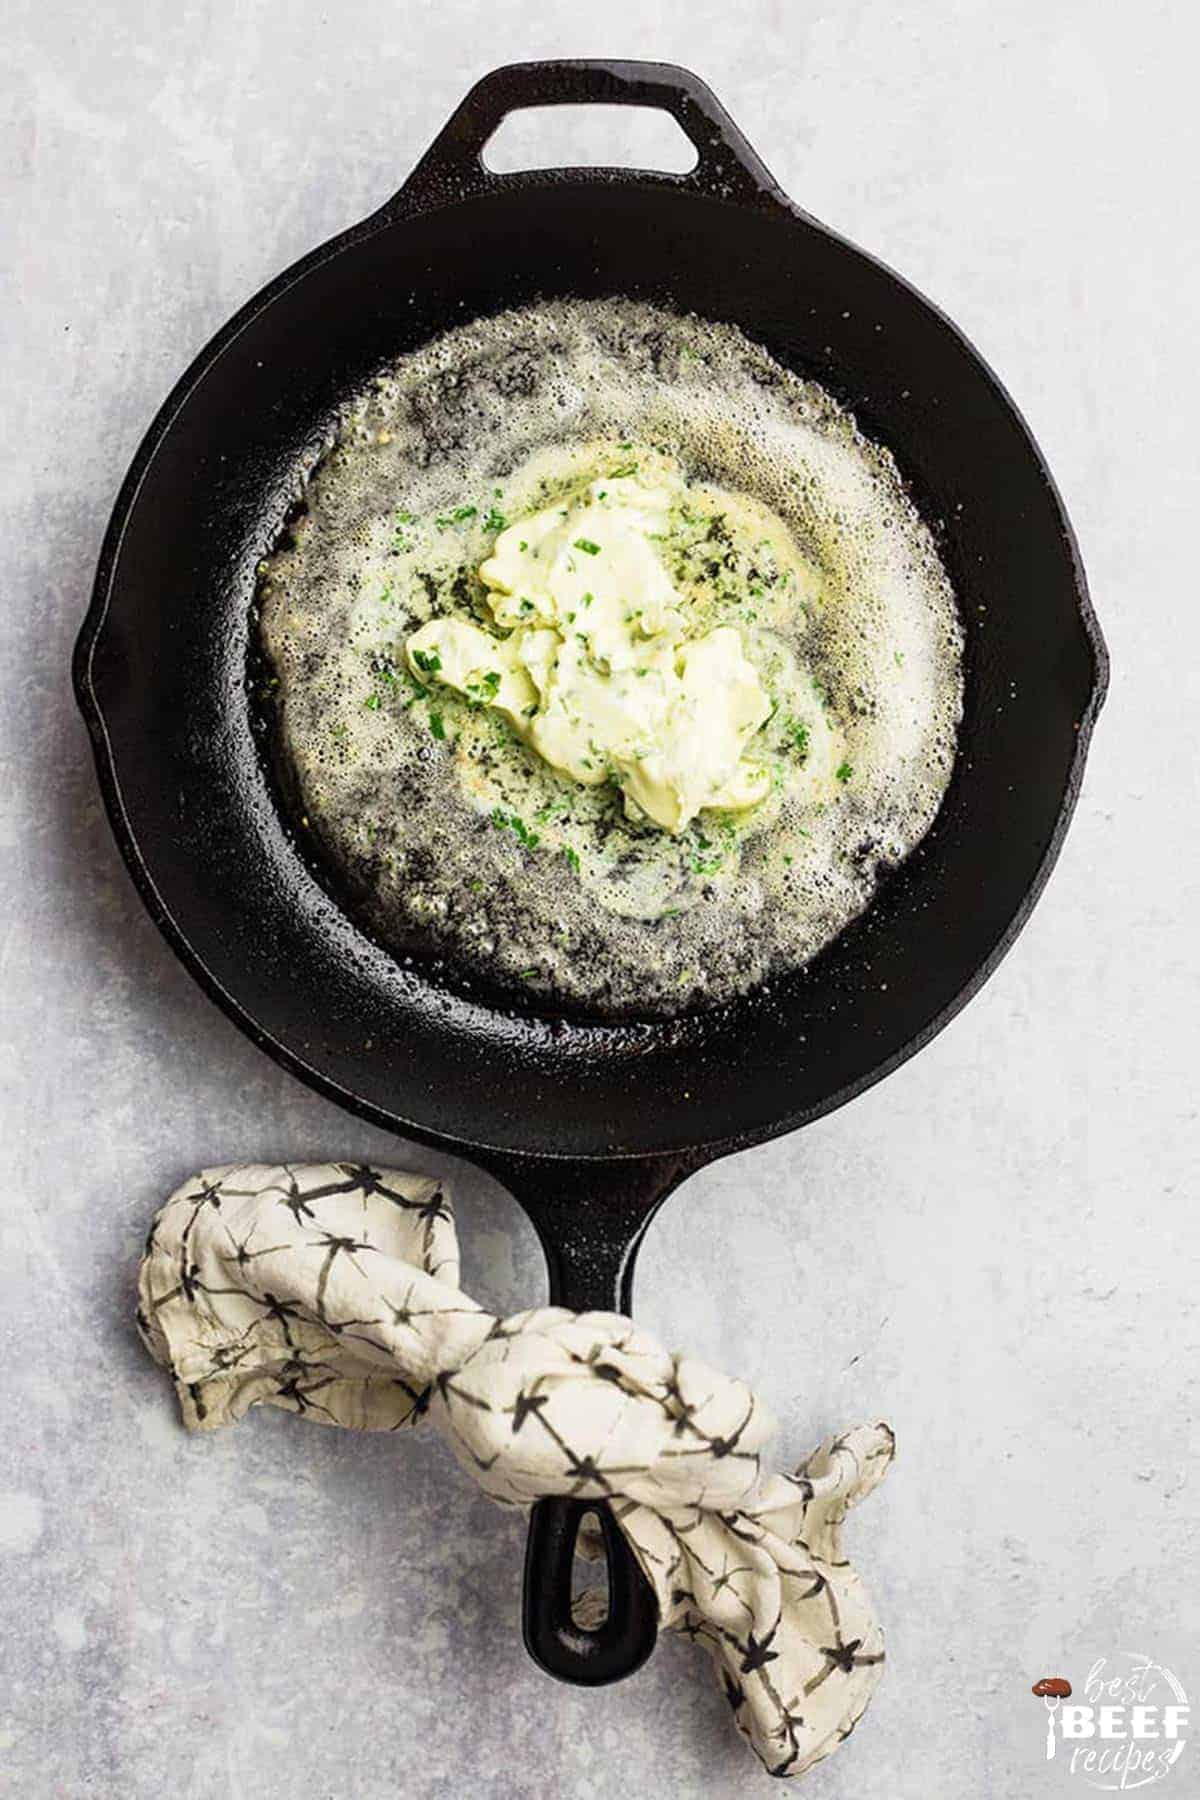 Melting the garlic butter in a skillet for garlic butter steak bites